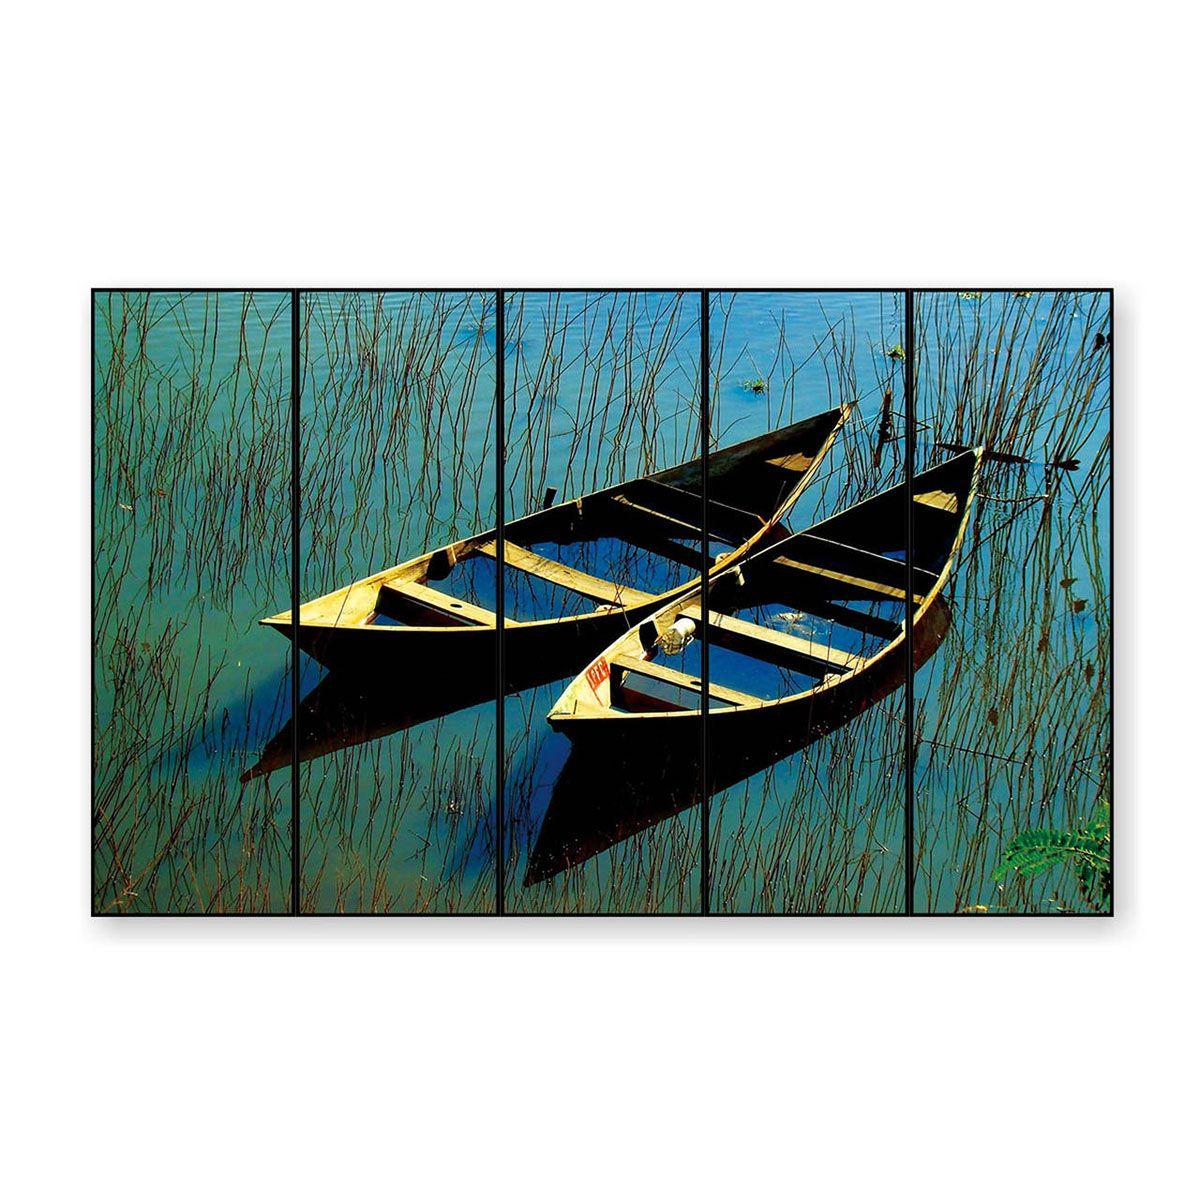 Quadro Decor As Canoas e o Lago